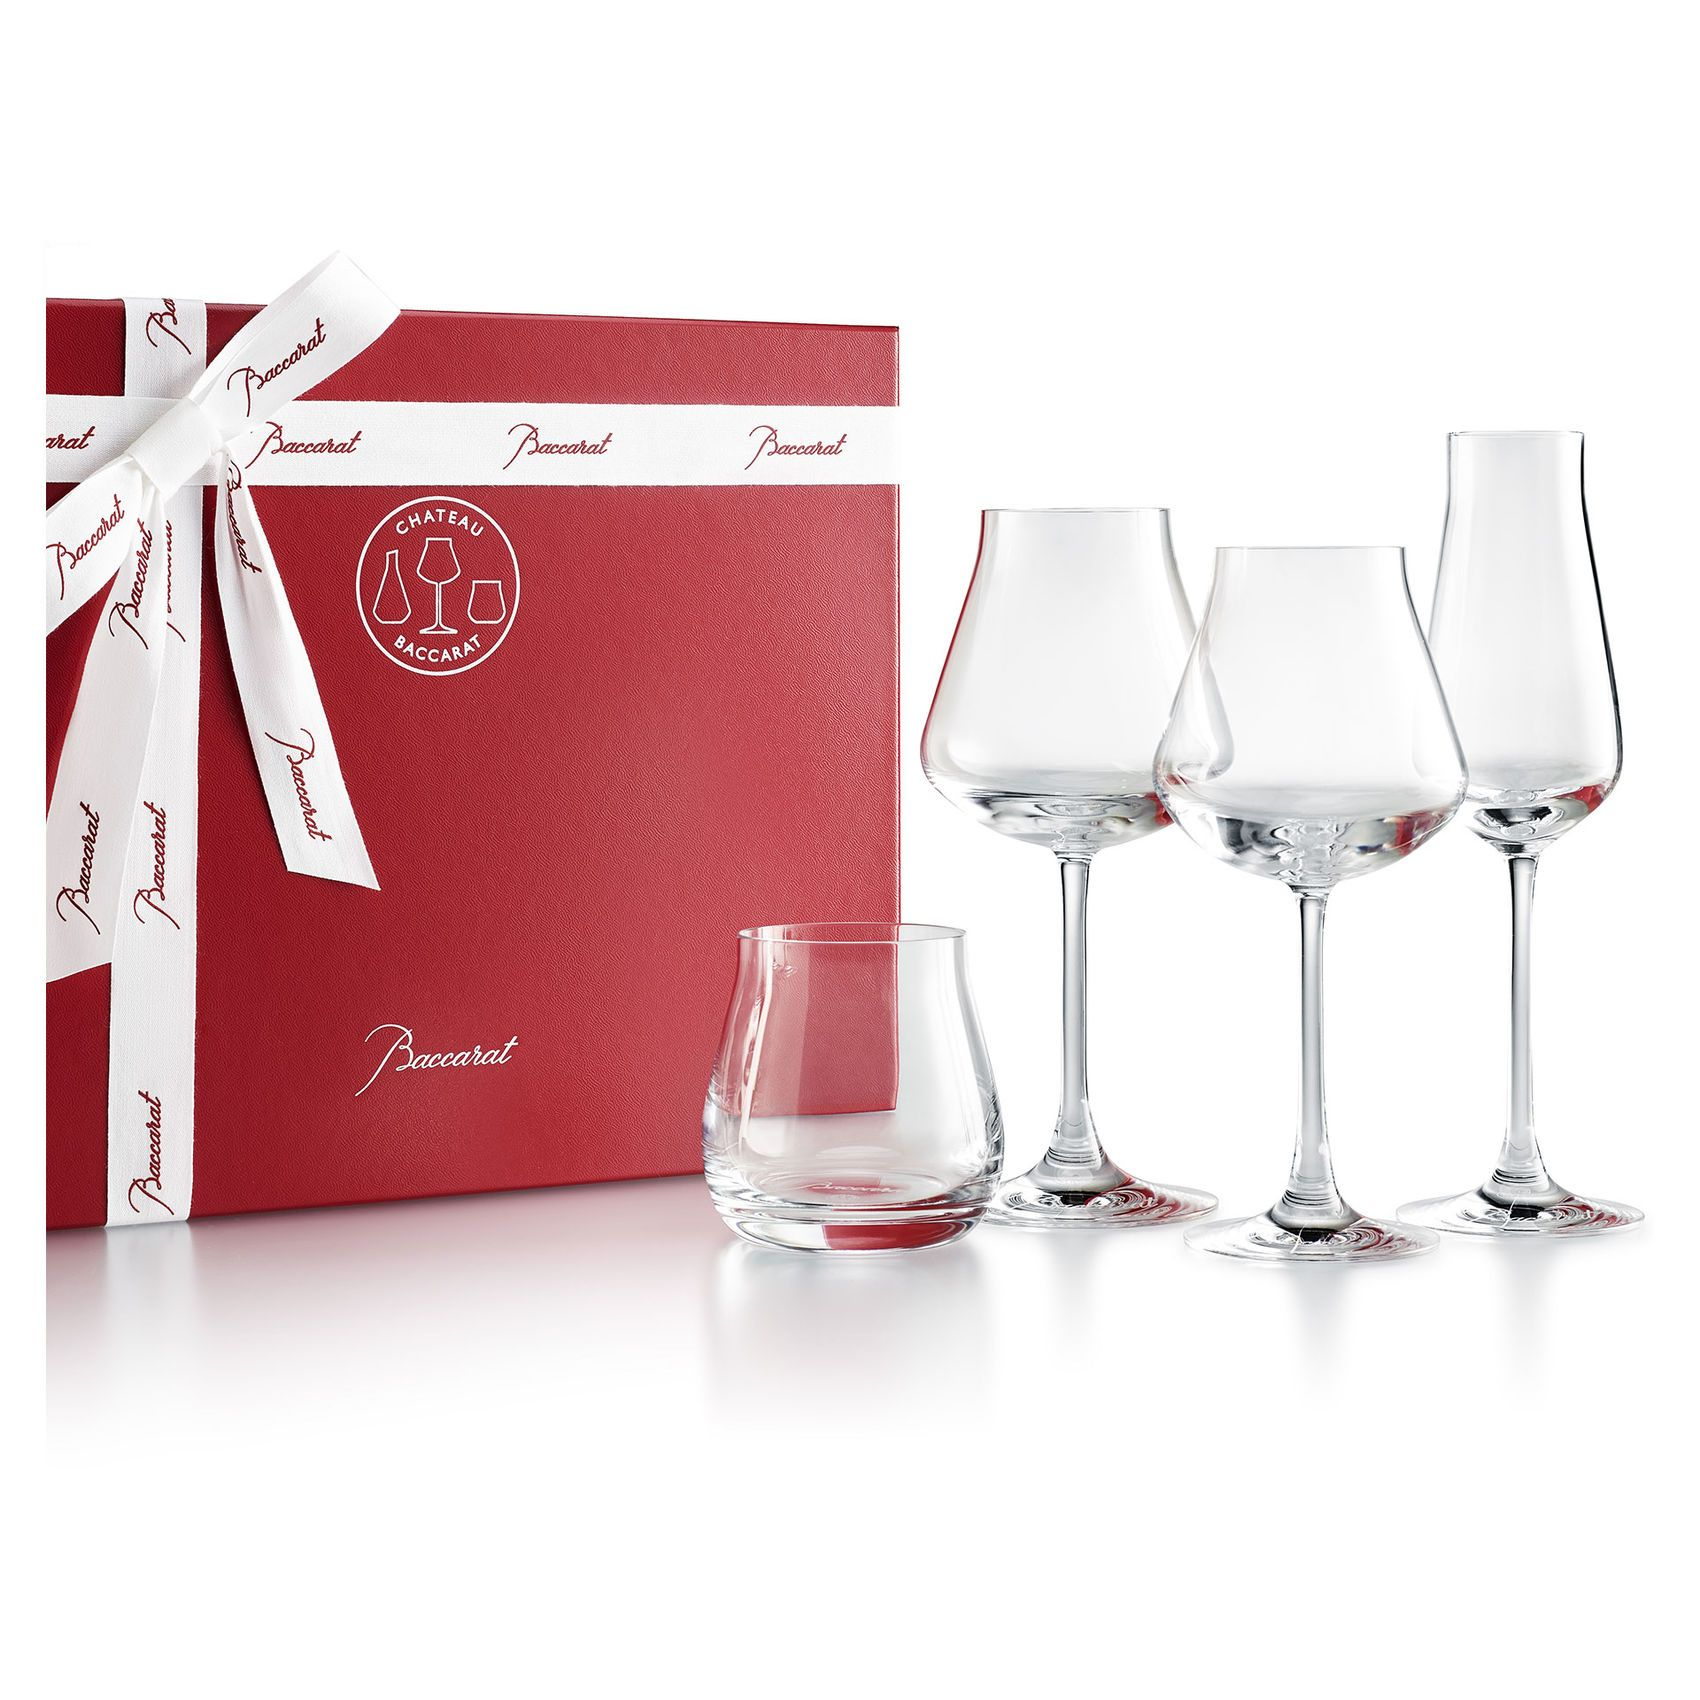 Baccarat Crystal Glasses Baccarat Crystal Degustationglasses Tablesetting Tabledecor Luxury Baccarat Wine Tasting Glasses Wine And Spirits